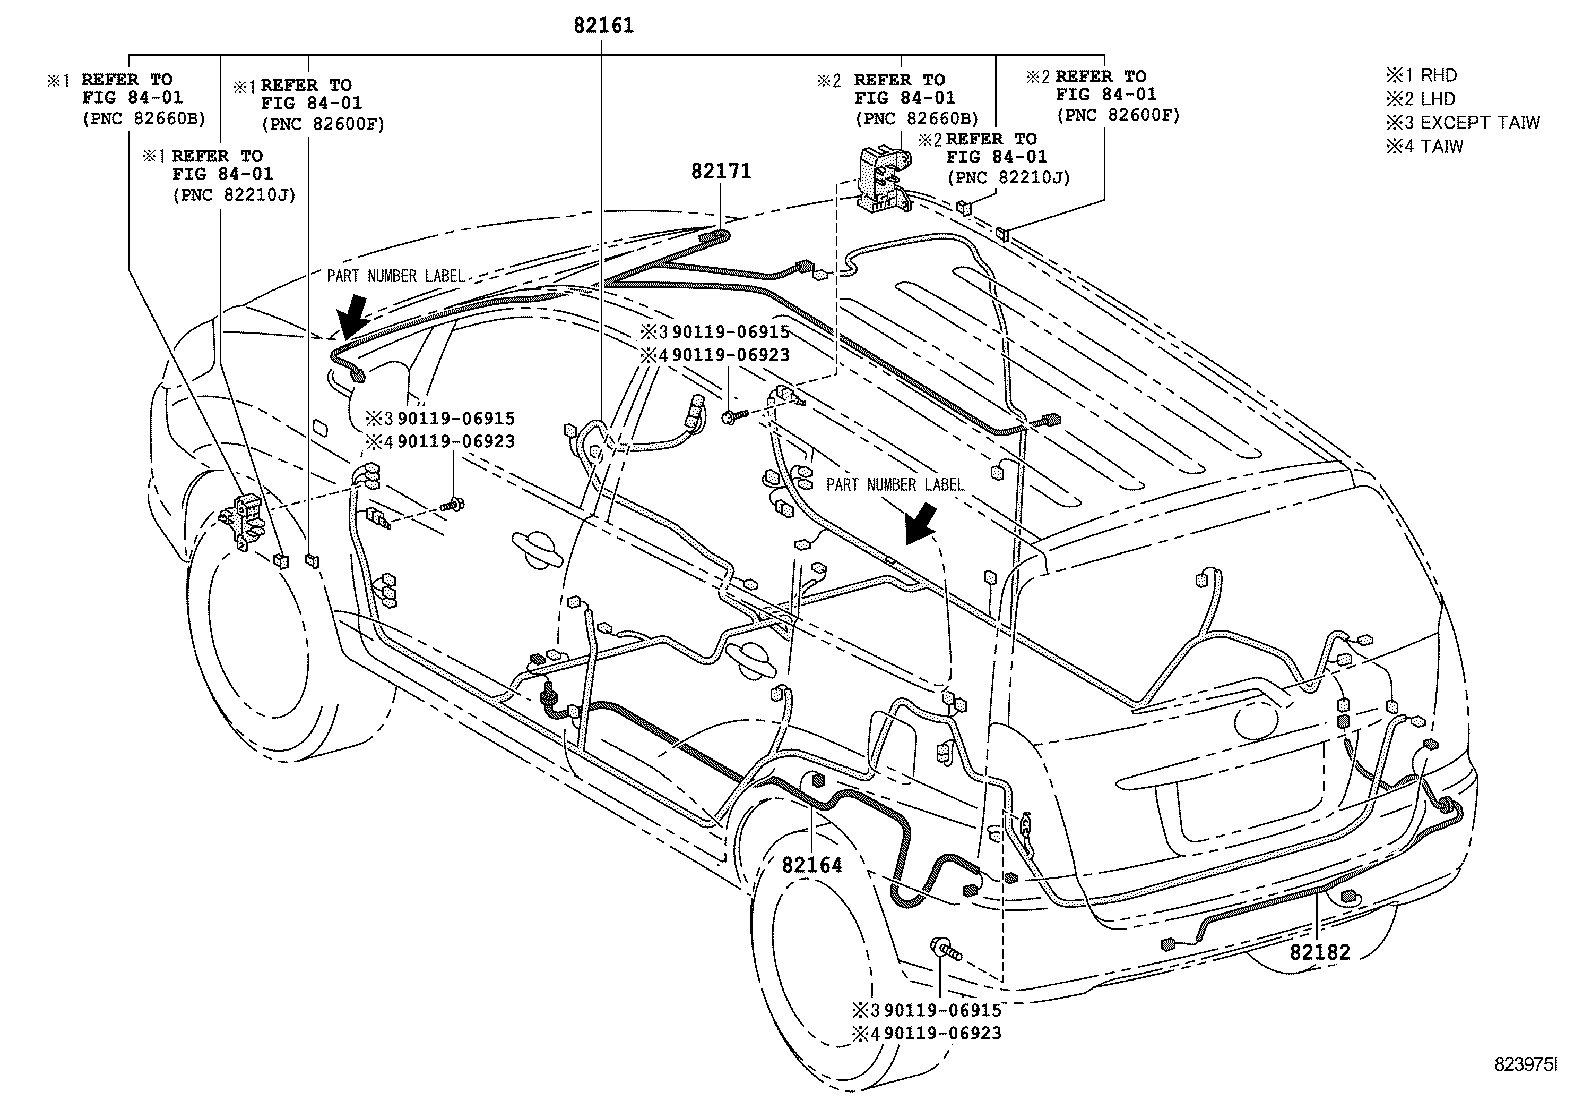 Toyota Innova Wiring Diagram : 28 Wiring Diagram Images